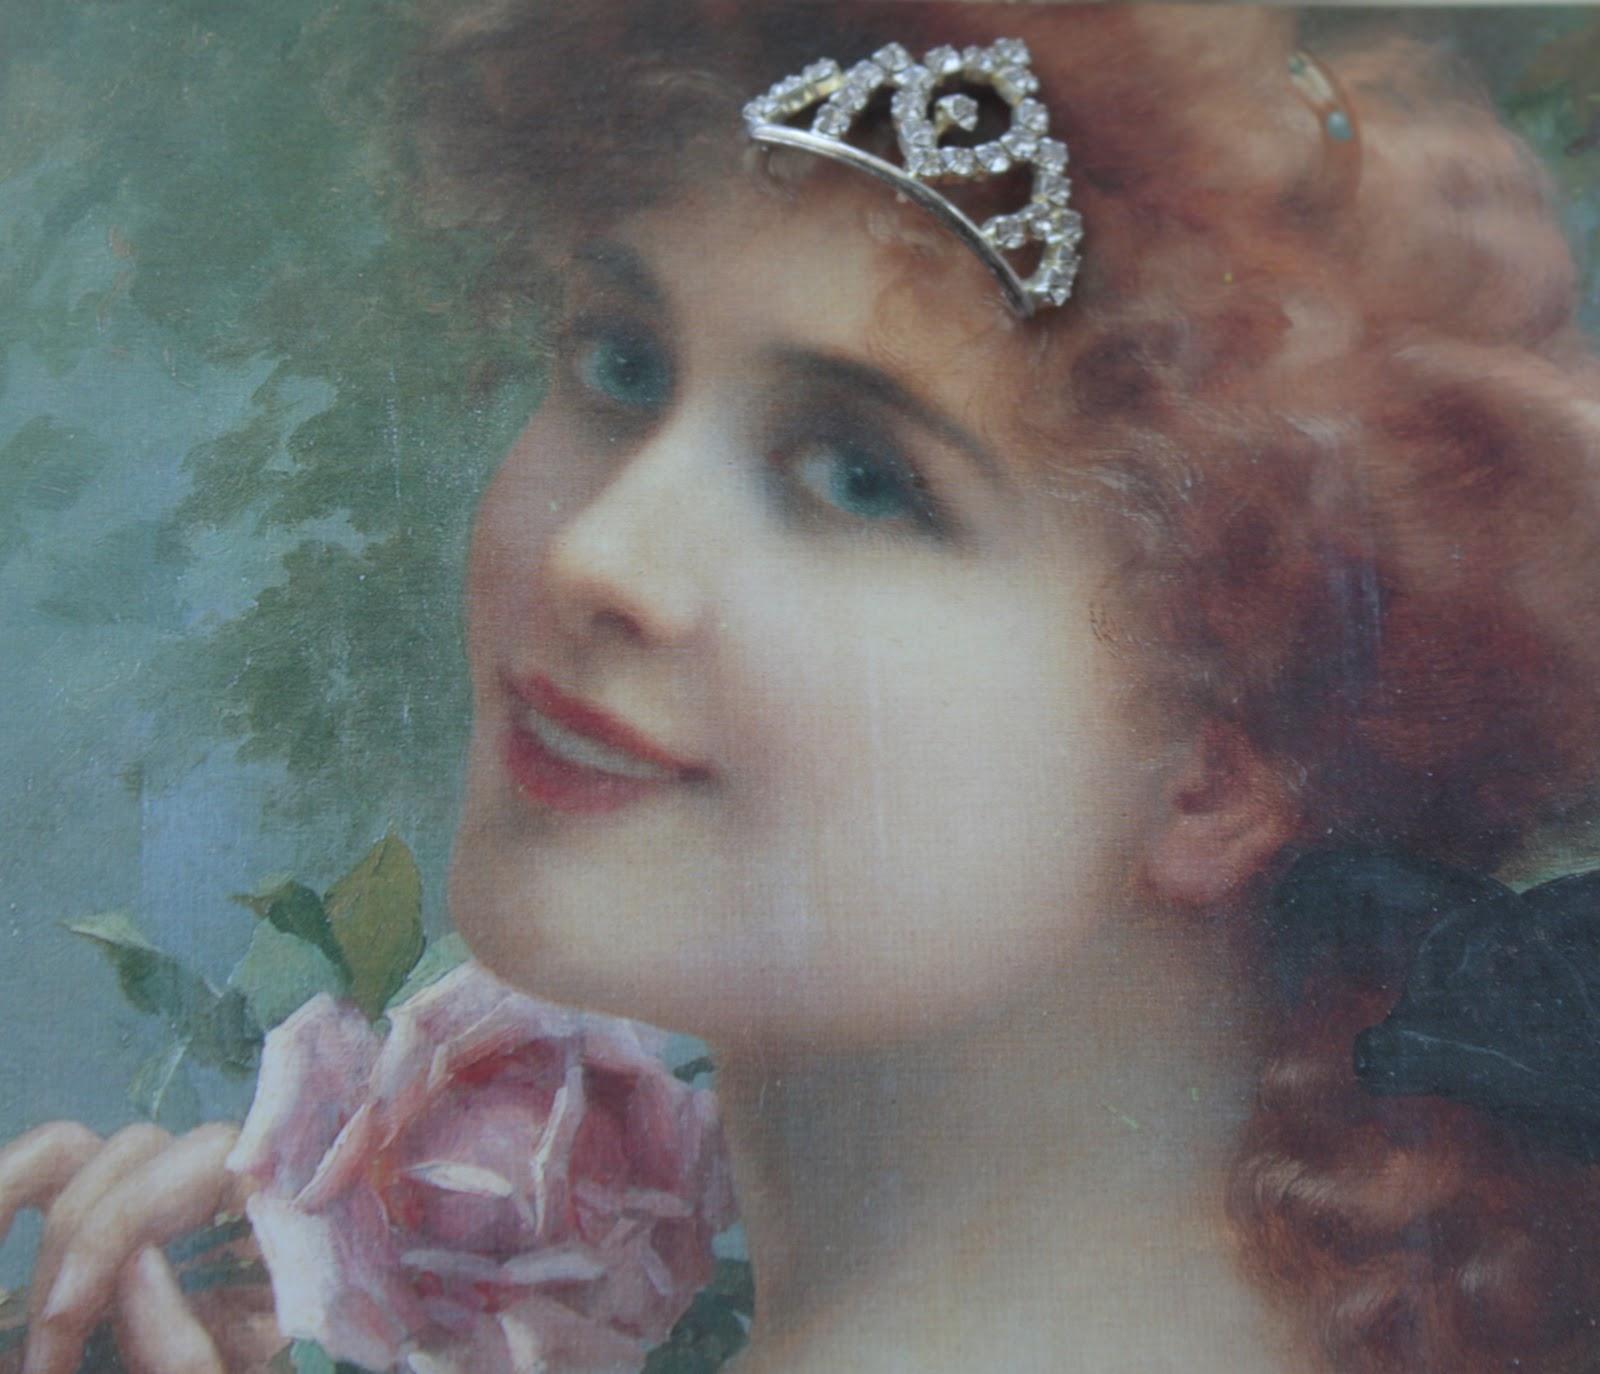 http://4.bp.blogspot.com/-jCLPQ5Bt-y4/Tn0QA6WTxNI/AAAAAAAAGk0/Ok94zaXHZgE/s1600/queen+of+the+flowers+1.jpg